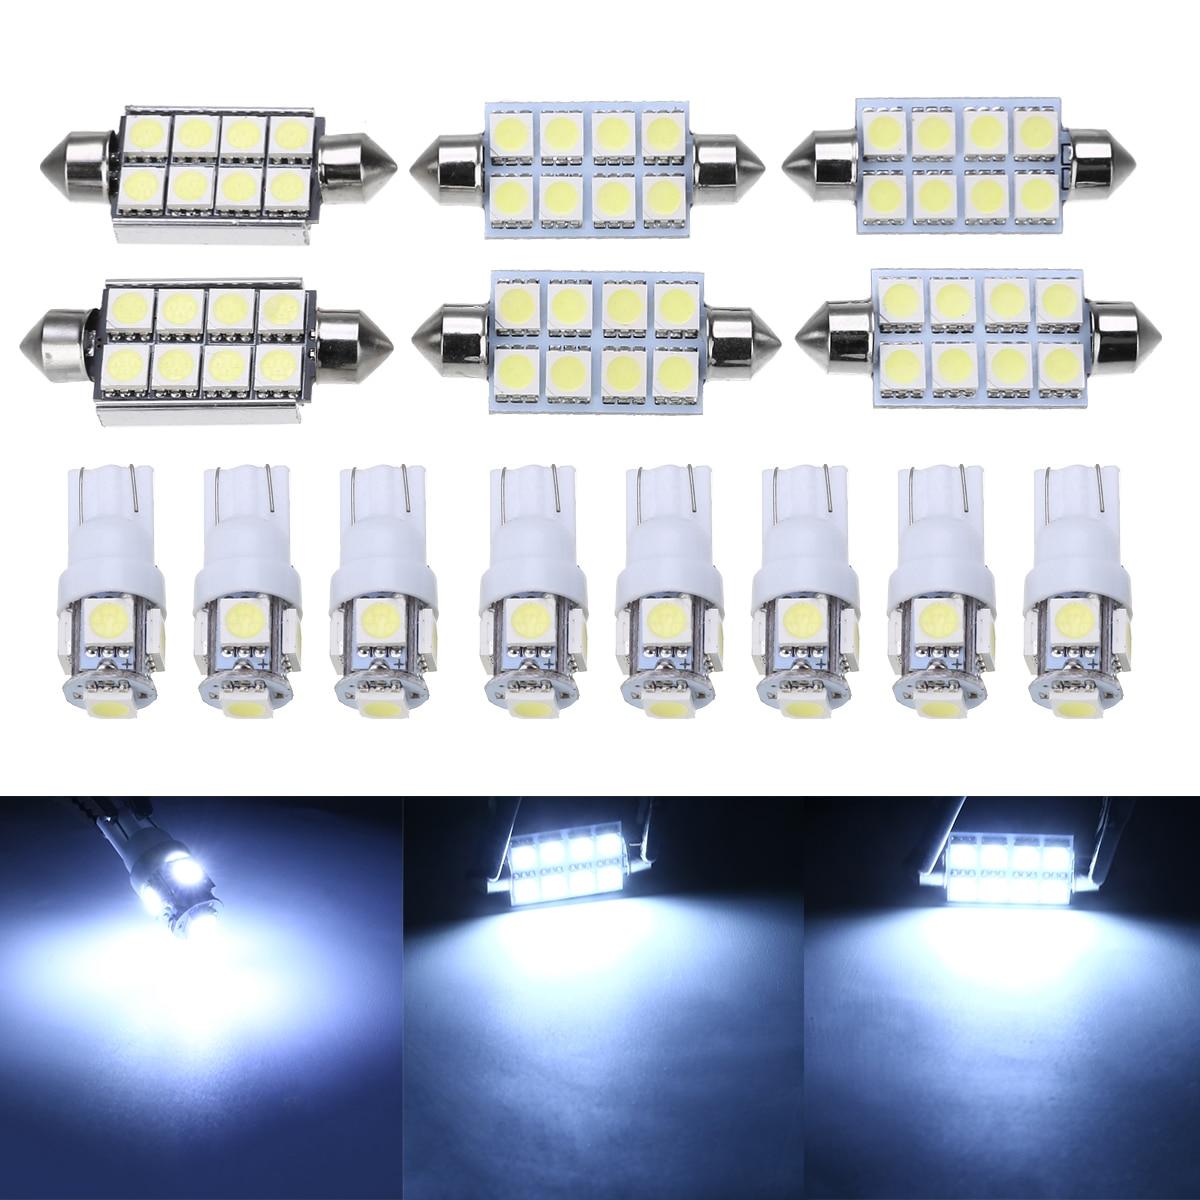 14pcs Car Interior Lamp Light White LED Interior Light Bulb Kit Set For Dodge Ram 1500 2500 2002-2011